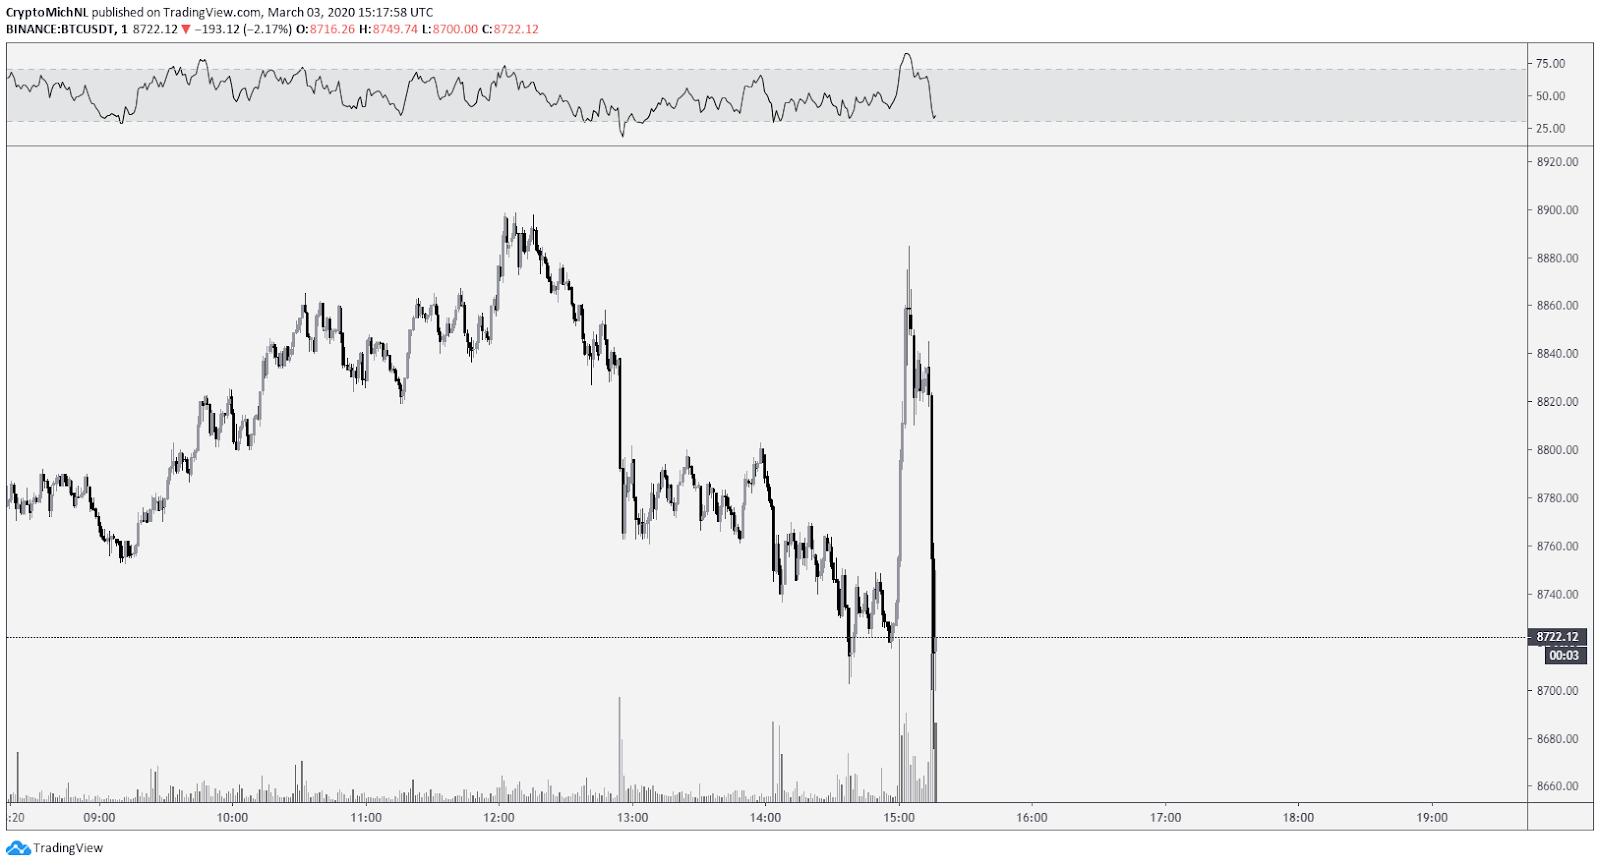 BTC USDT 1-minute chart. Source: TradingView